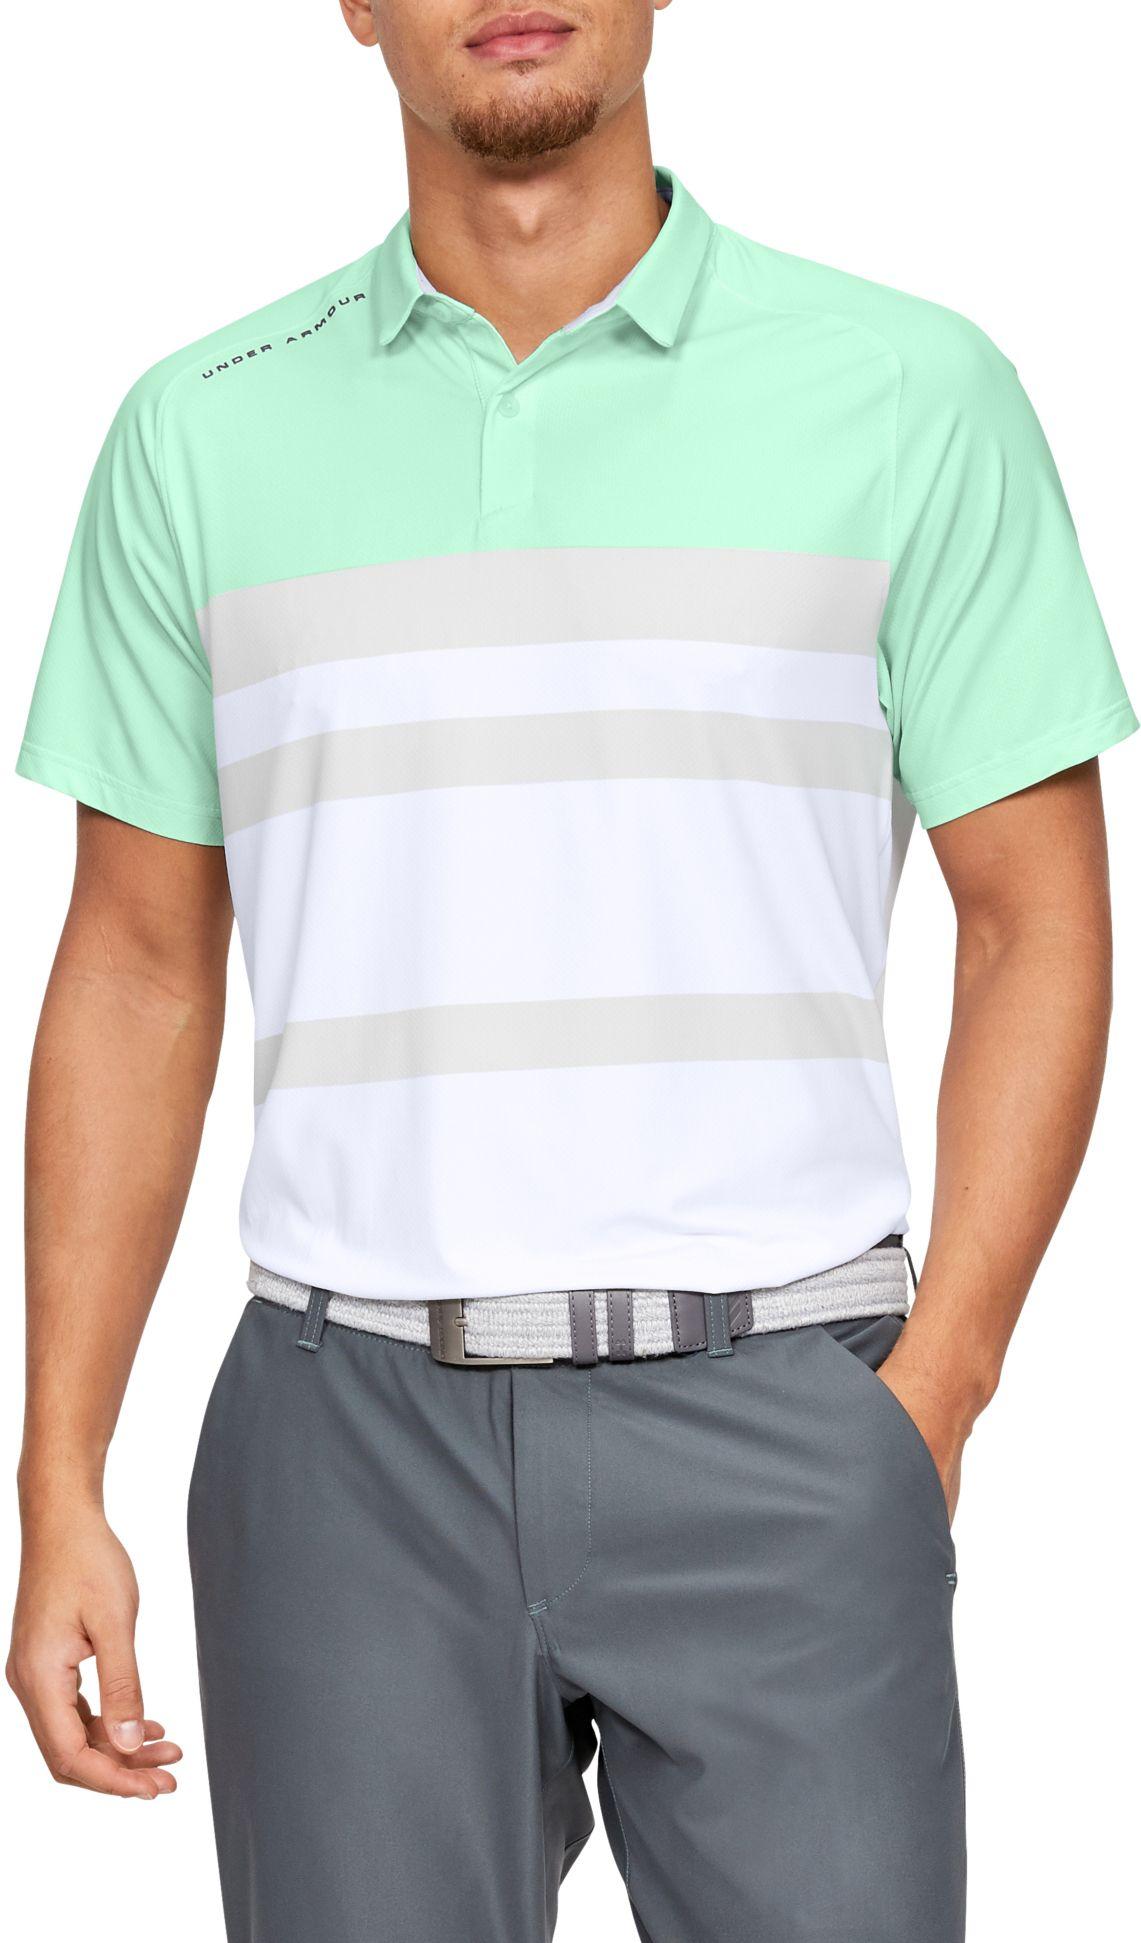 Under Armour Men's IsoChill Block Golf Polo, Size: Small, Aqua Foam thumbnail